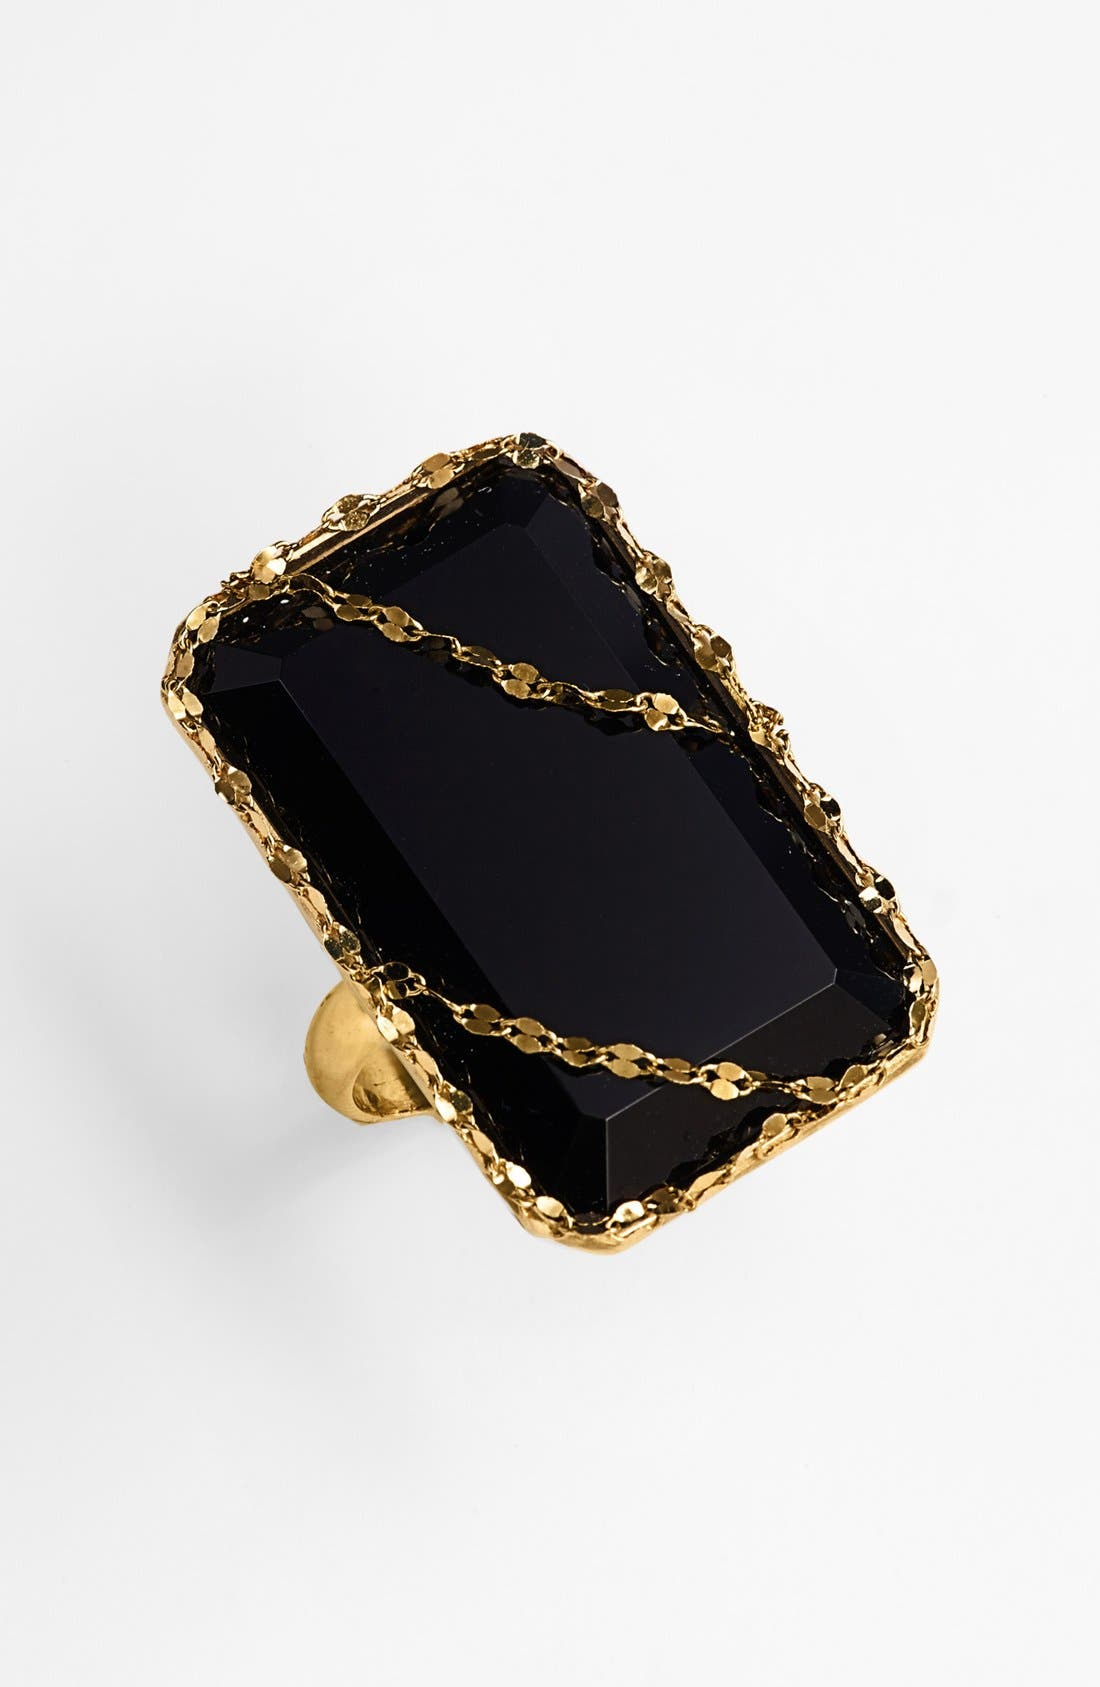 Main Image - Lana Jewelry 'Spellbound - Noir' Stone Ring